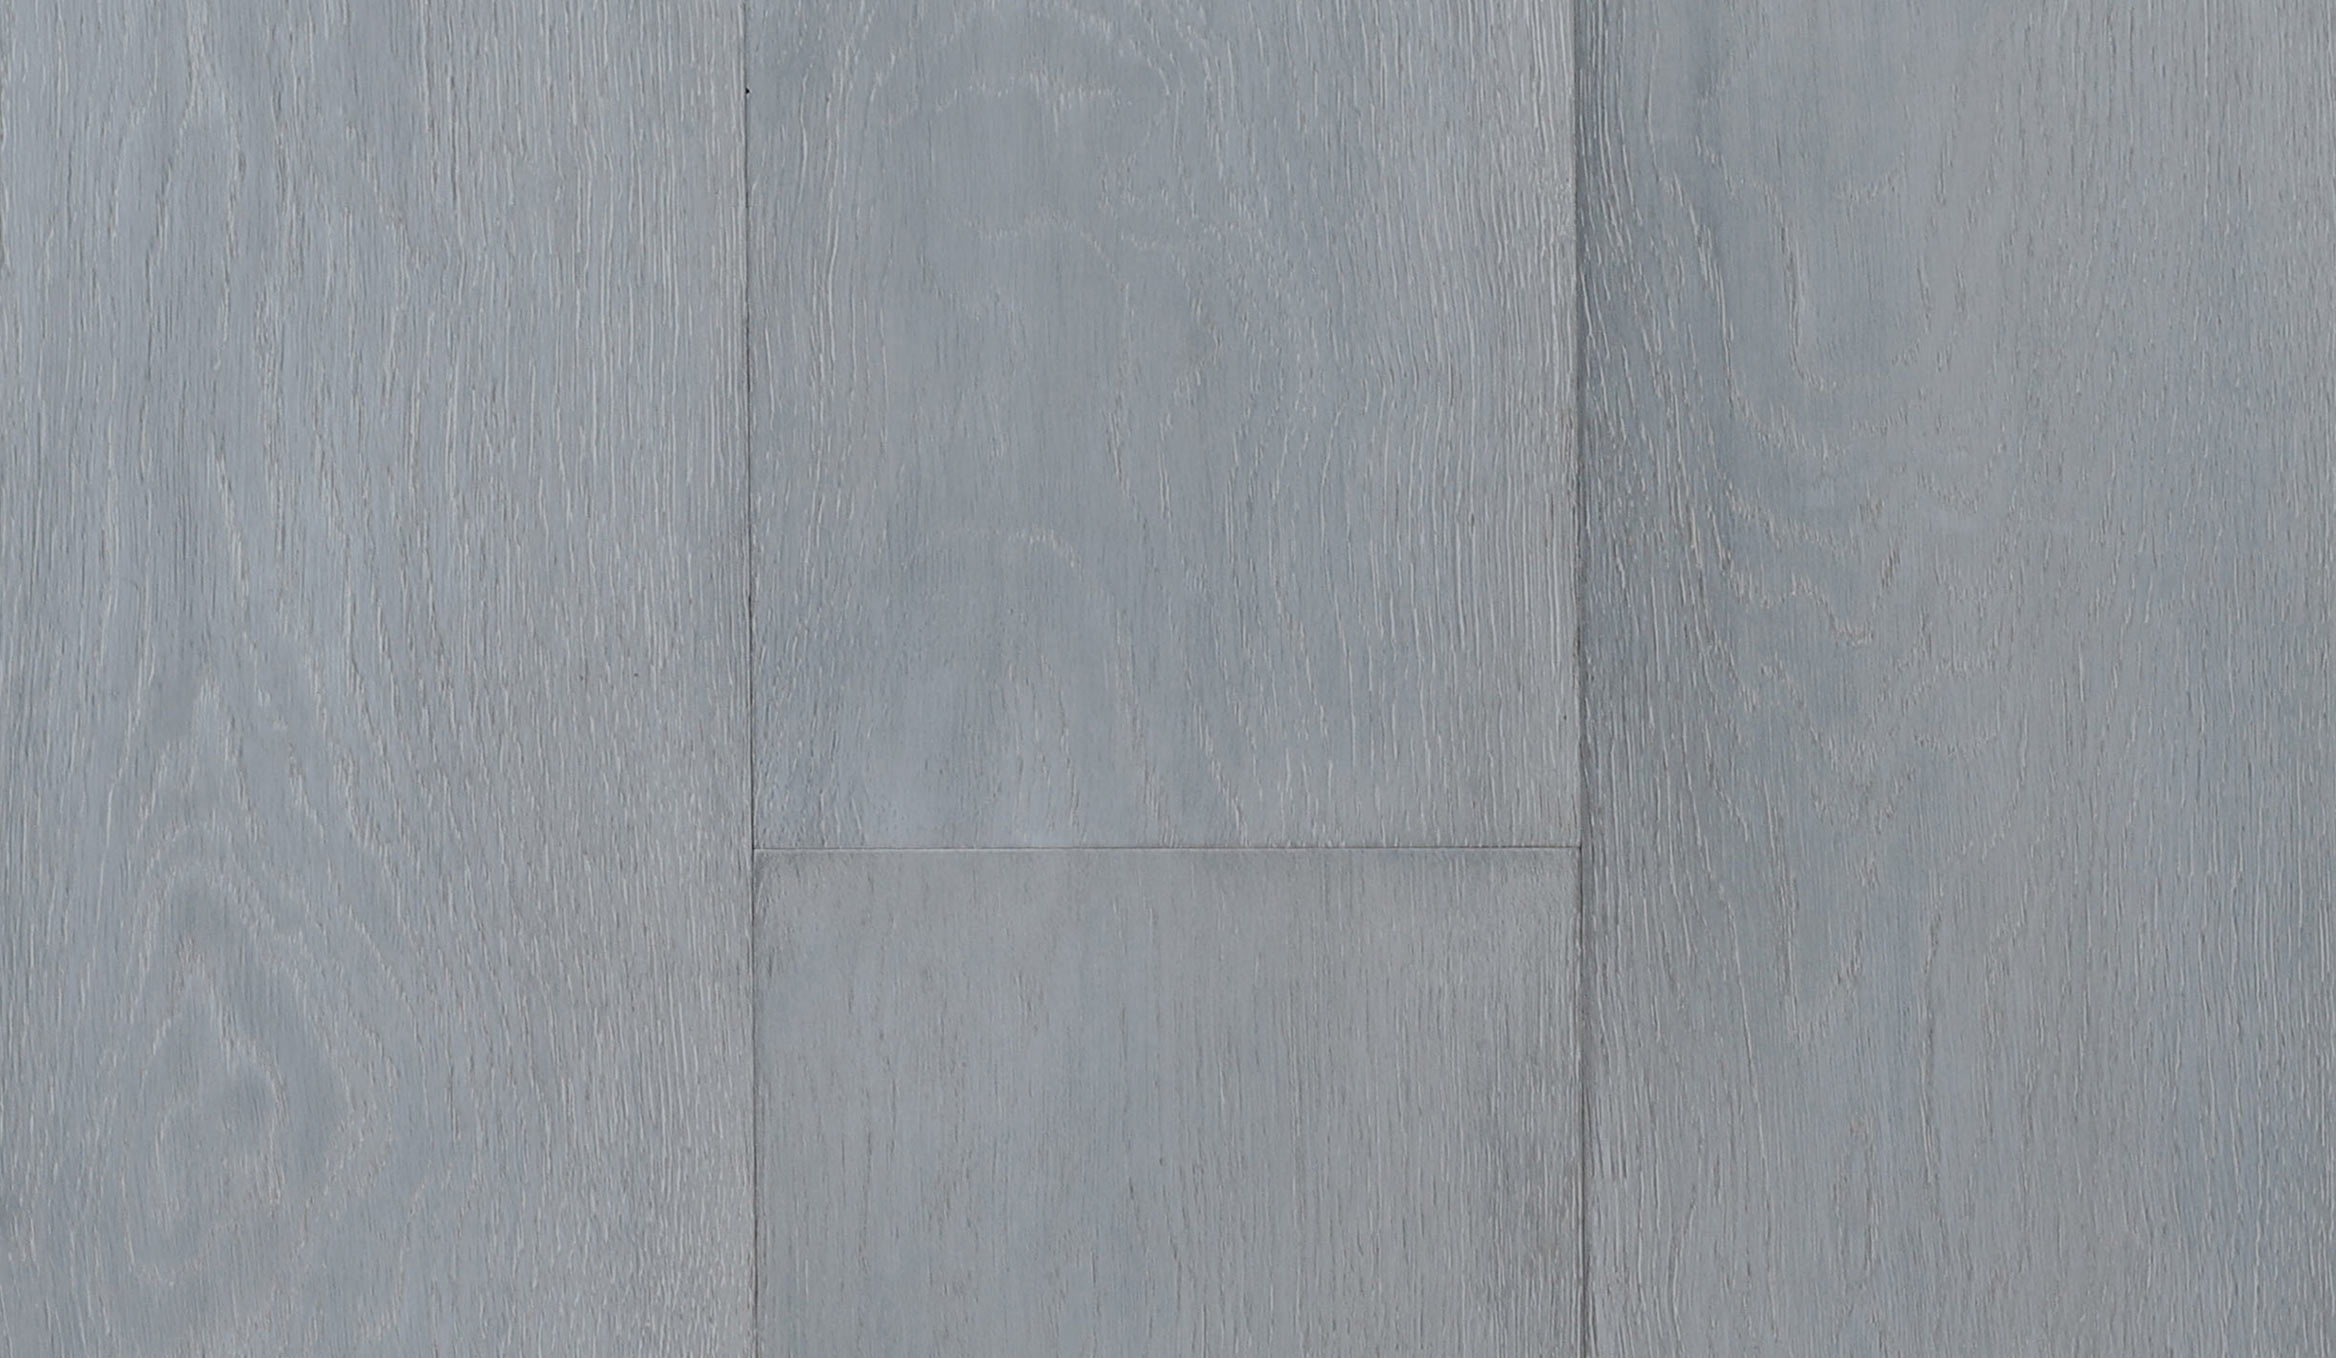 Synfonia Flooring Basie Collection Hardwood Floors